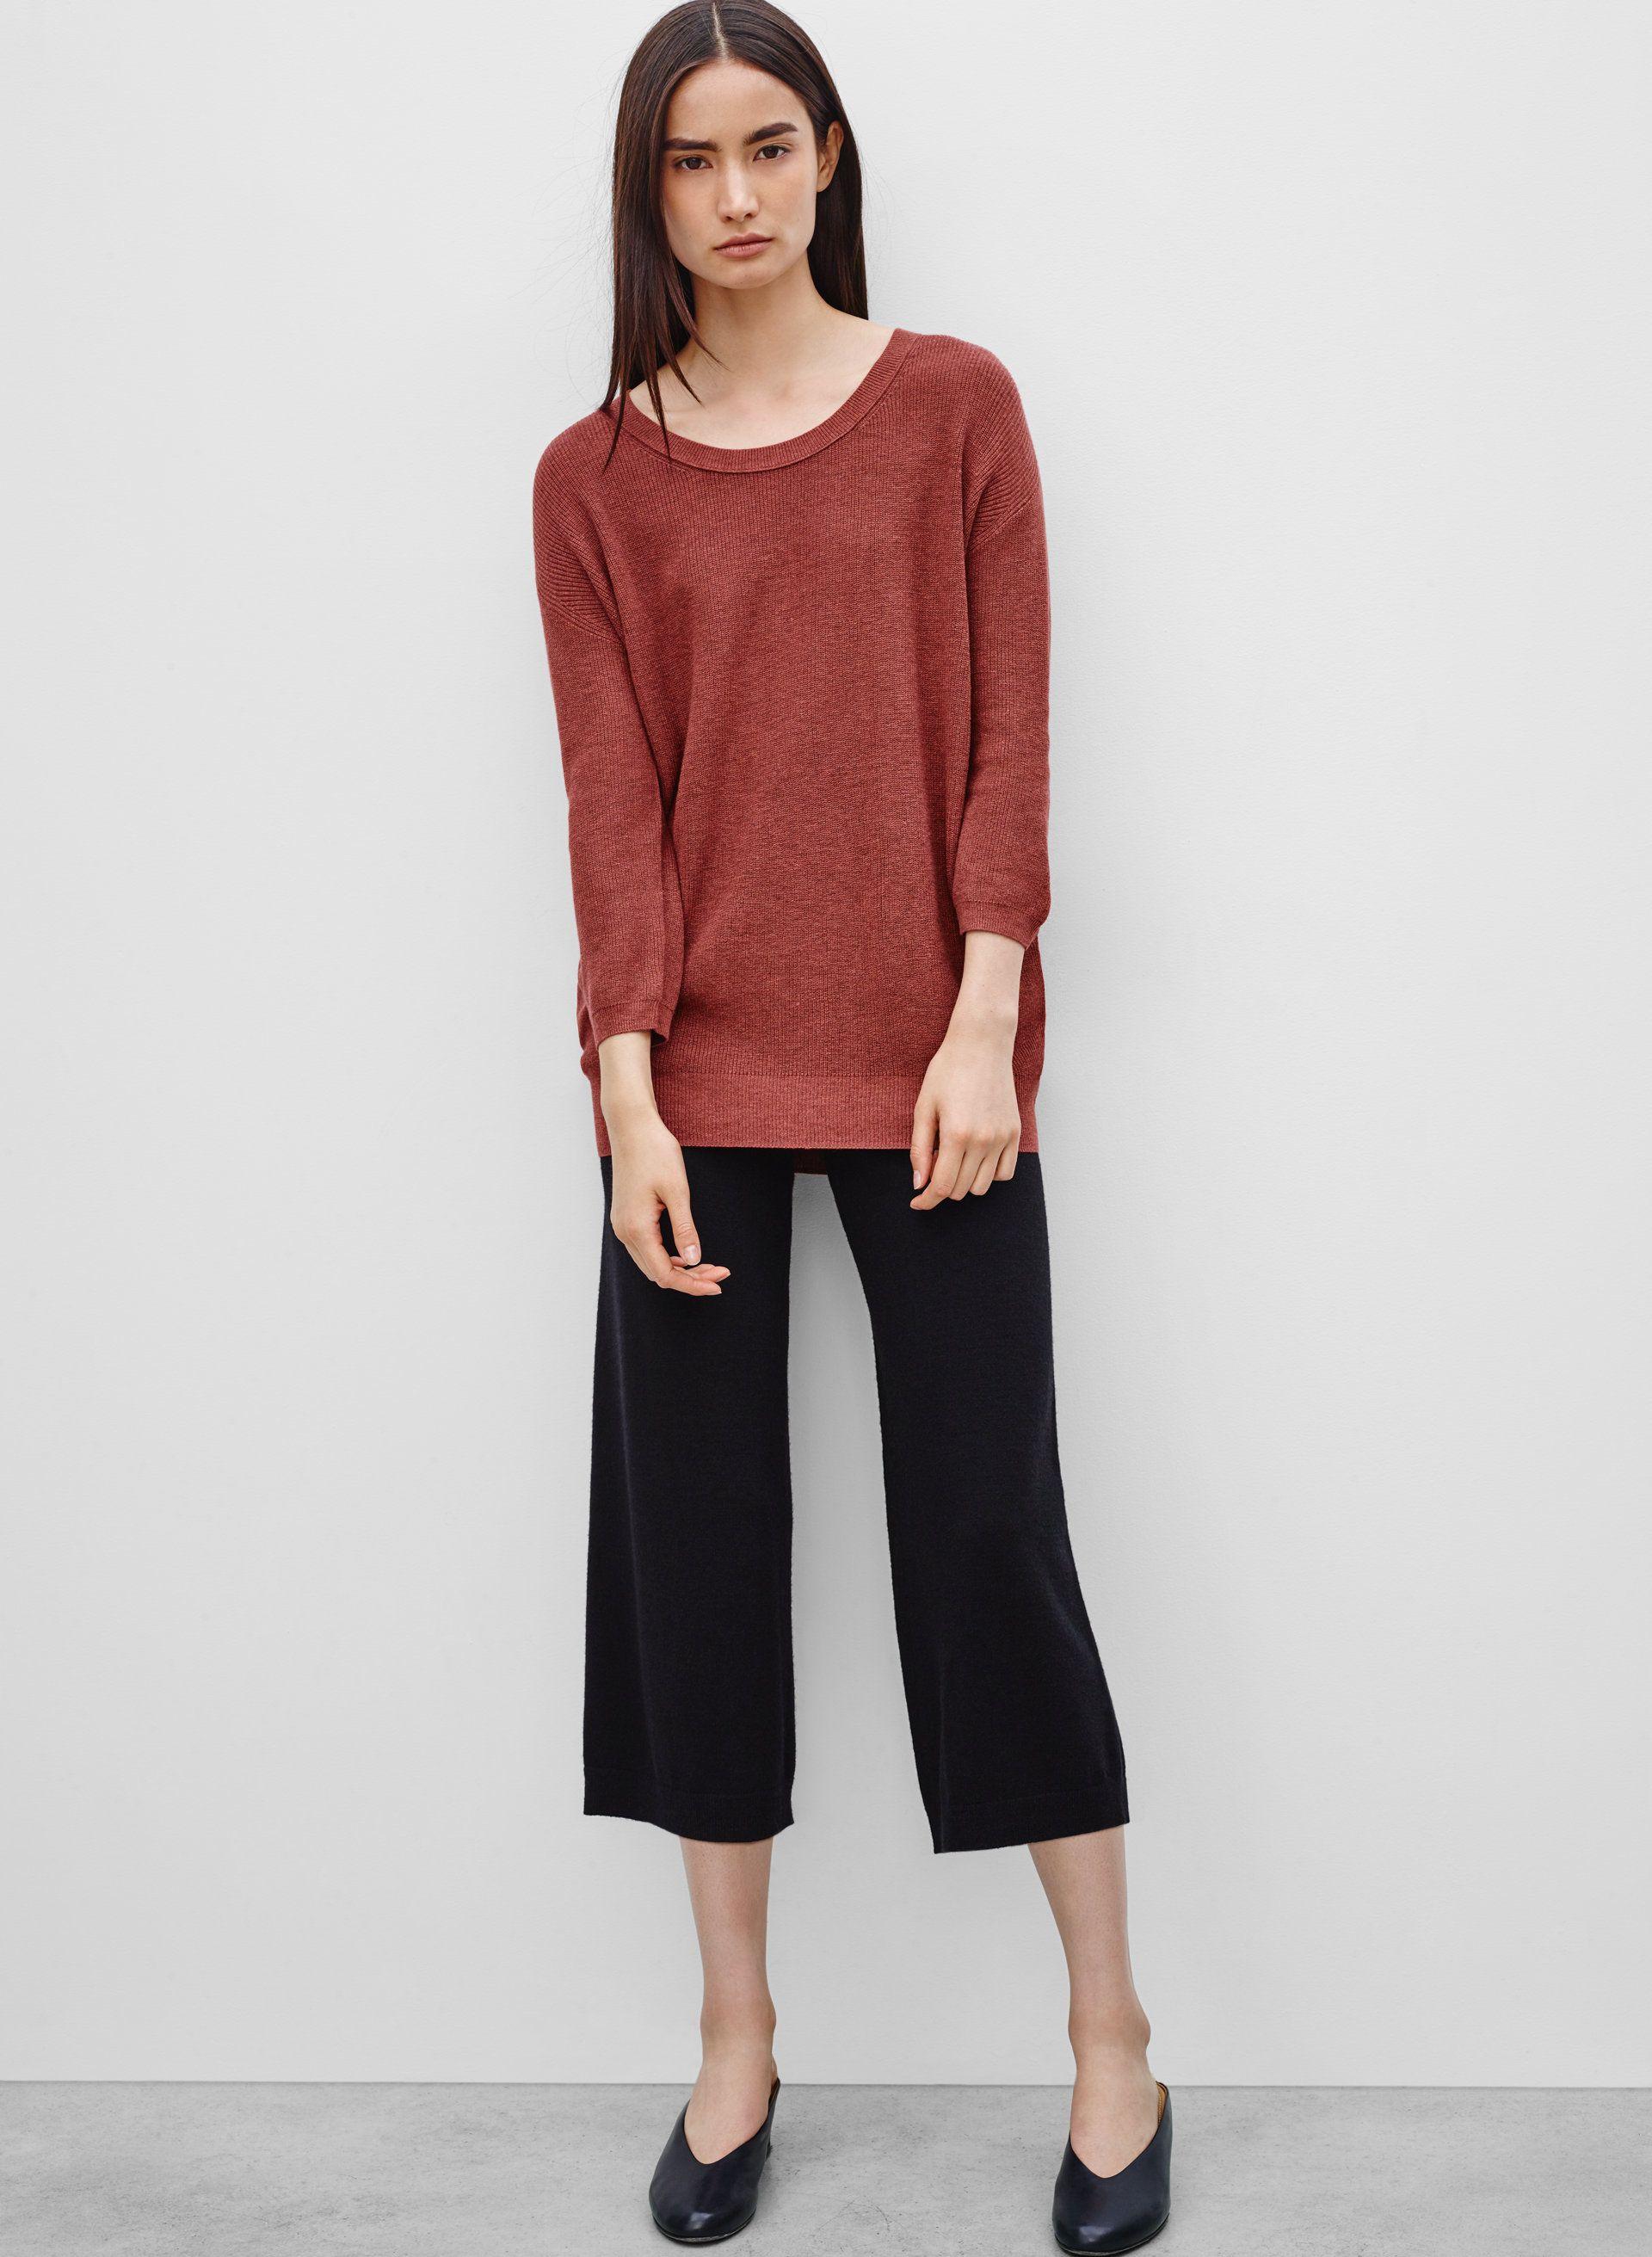 4f2571b3d25f13 Balzac sweater | Sweaters & Cardigans | Jumpers, Blouse dress ...